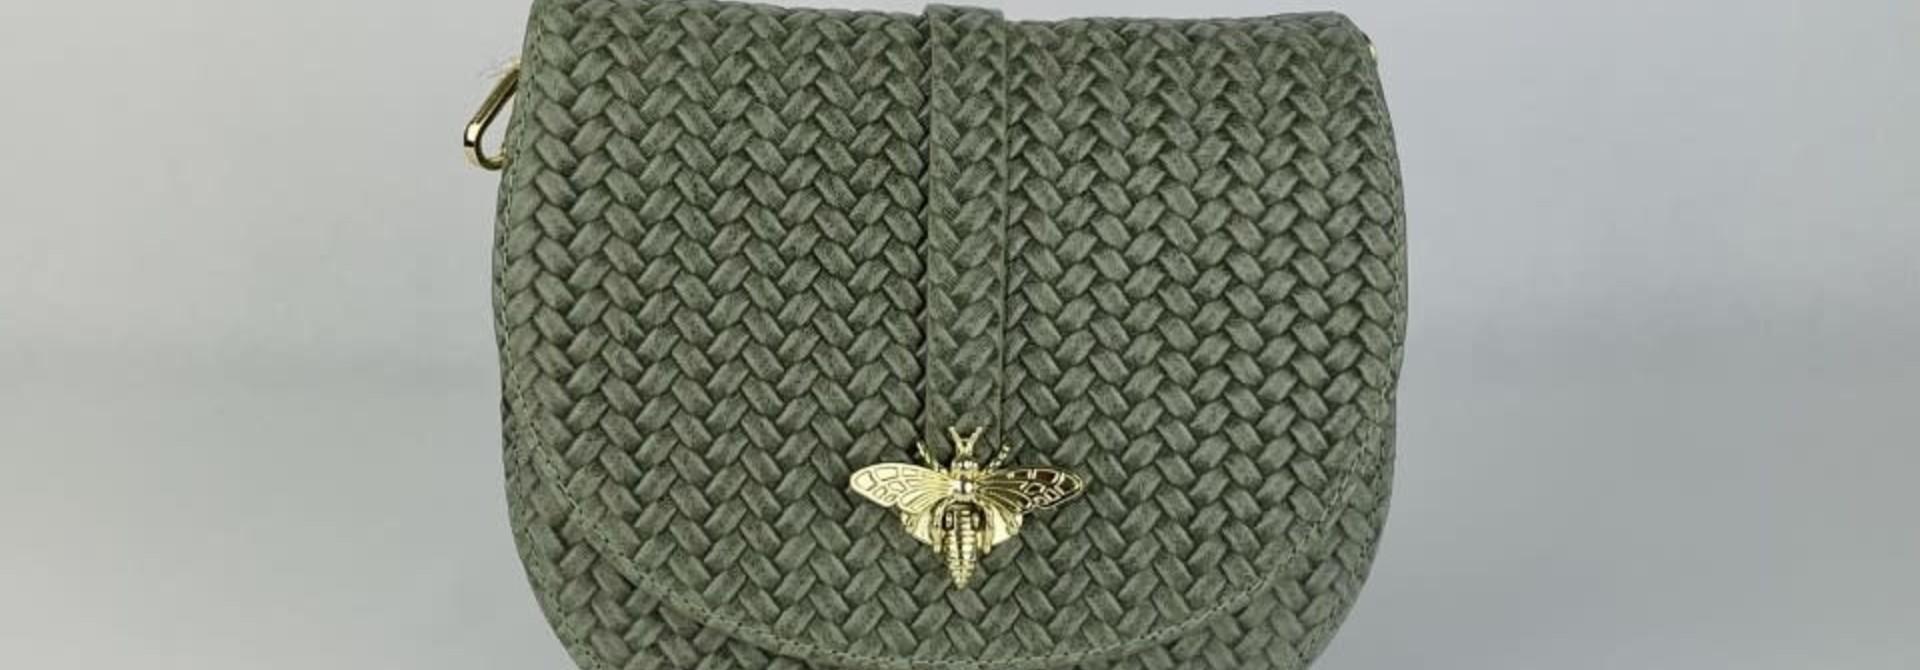 Cléo calf leather dragonfly bag Moss